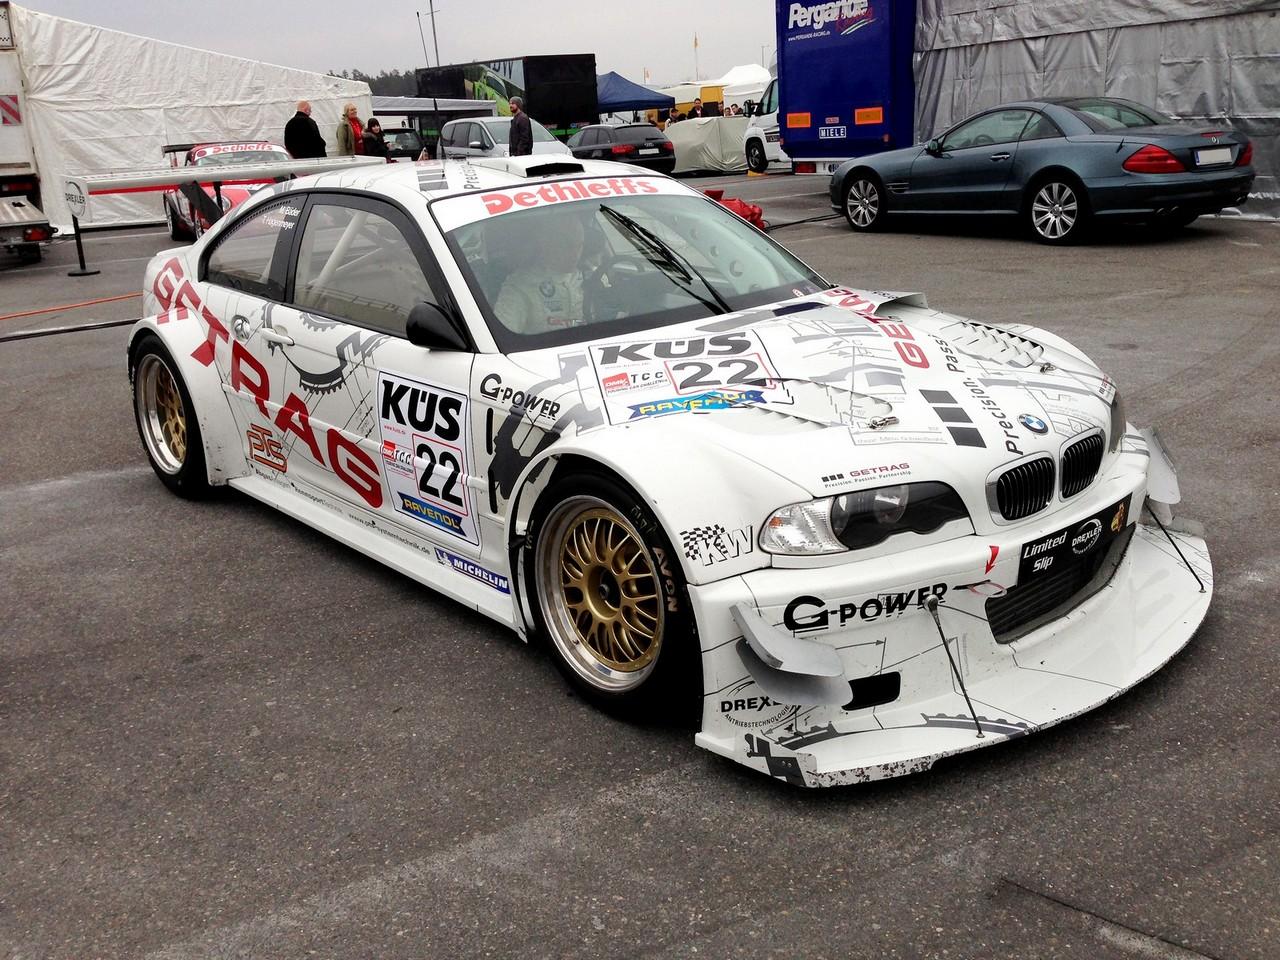 BMW Convertible bmw e46 supercharger for sale G-Power BMW E46 M3 Wows at International DMV TCC Season Opening ...